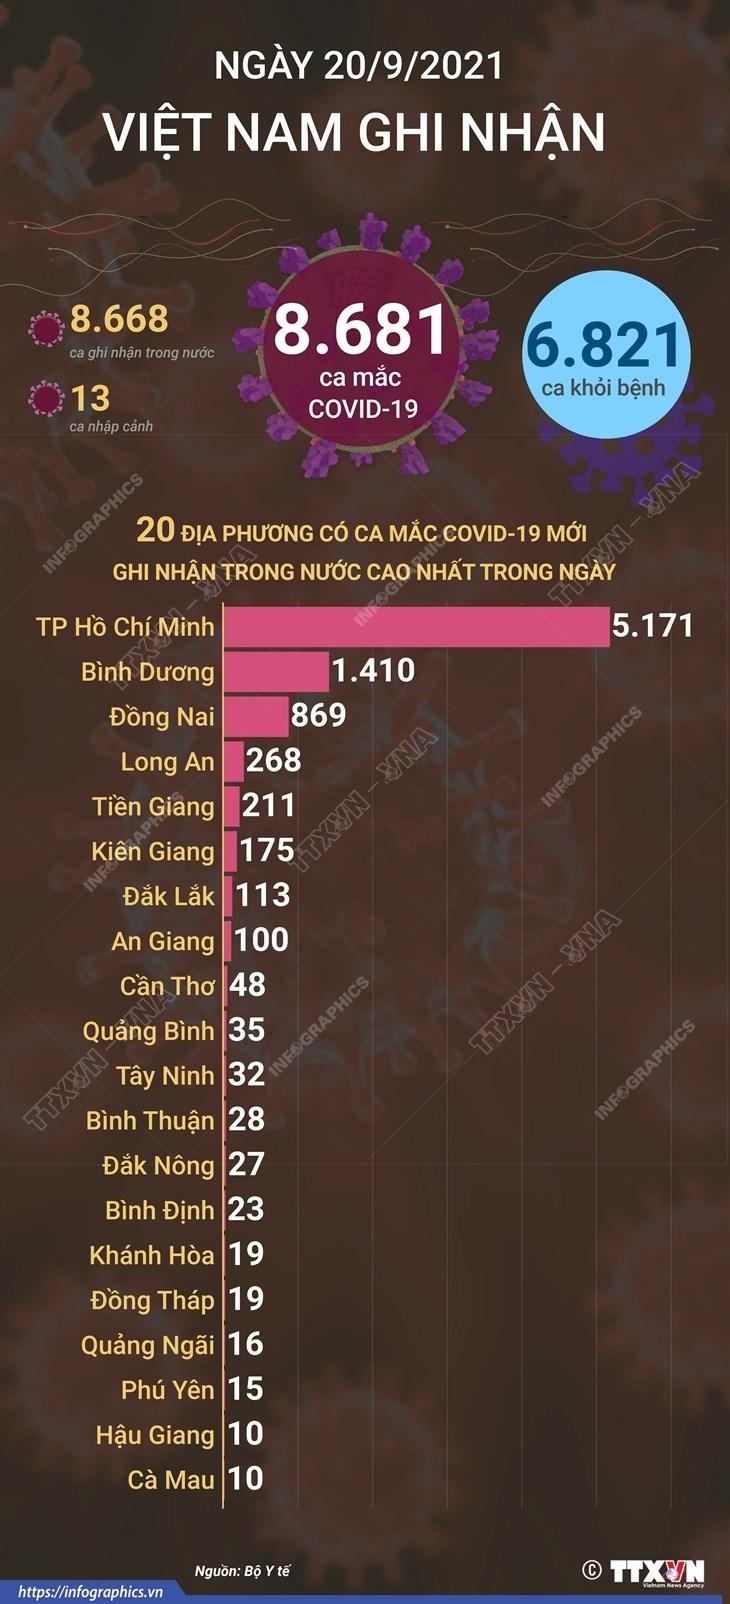 Ngay 20/9, Viet Nam co 8.681 ca mac COVID-19 va 6.821 ca khoi benh hinh anh 1